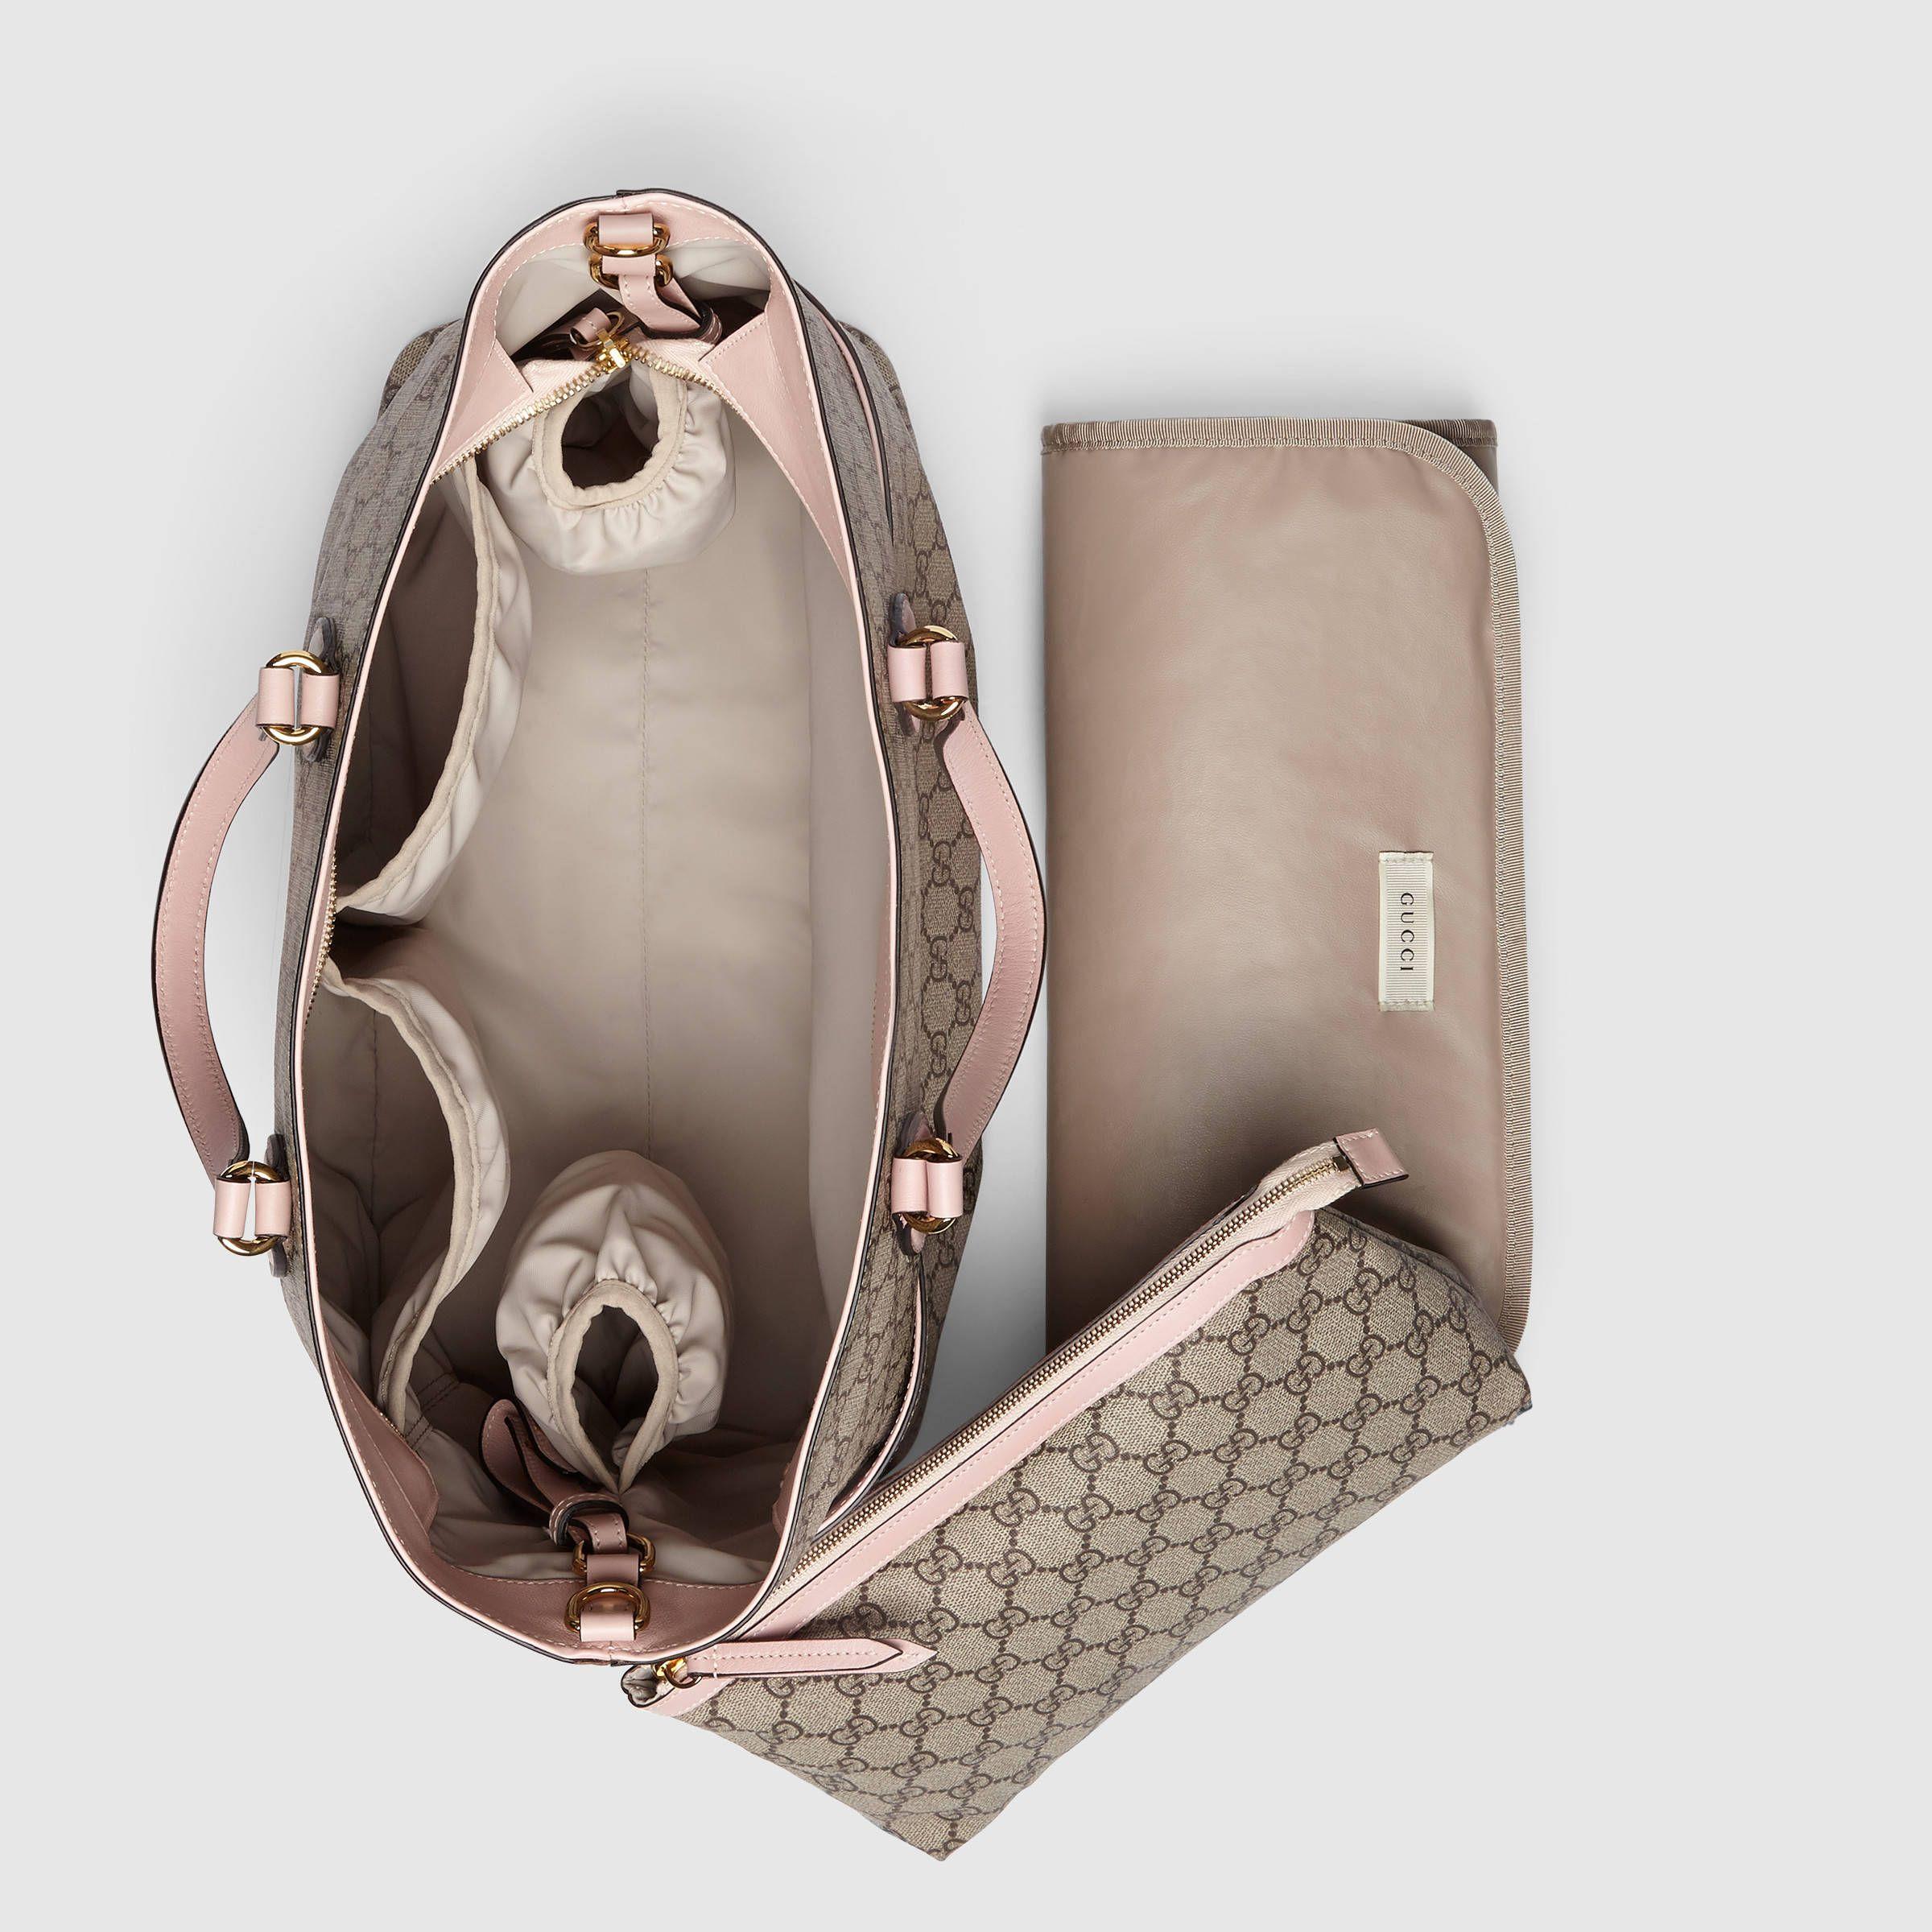 b520fe854b10 Soft GG Supreme diaper bag - Gucci Diaper Bags & Totes 457356K5ICG8268